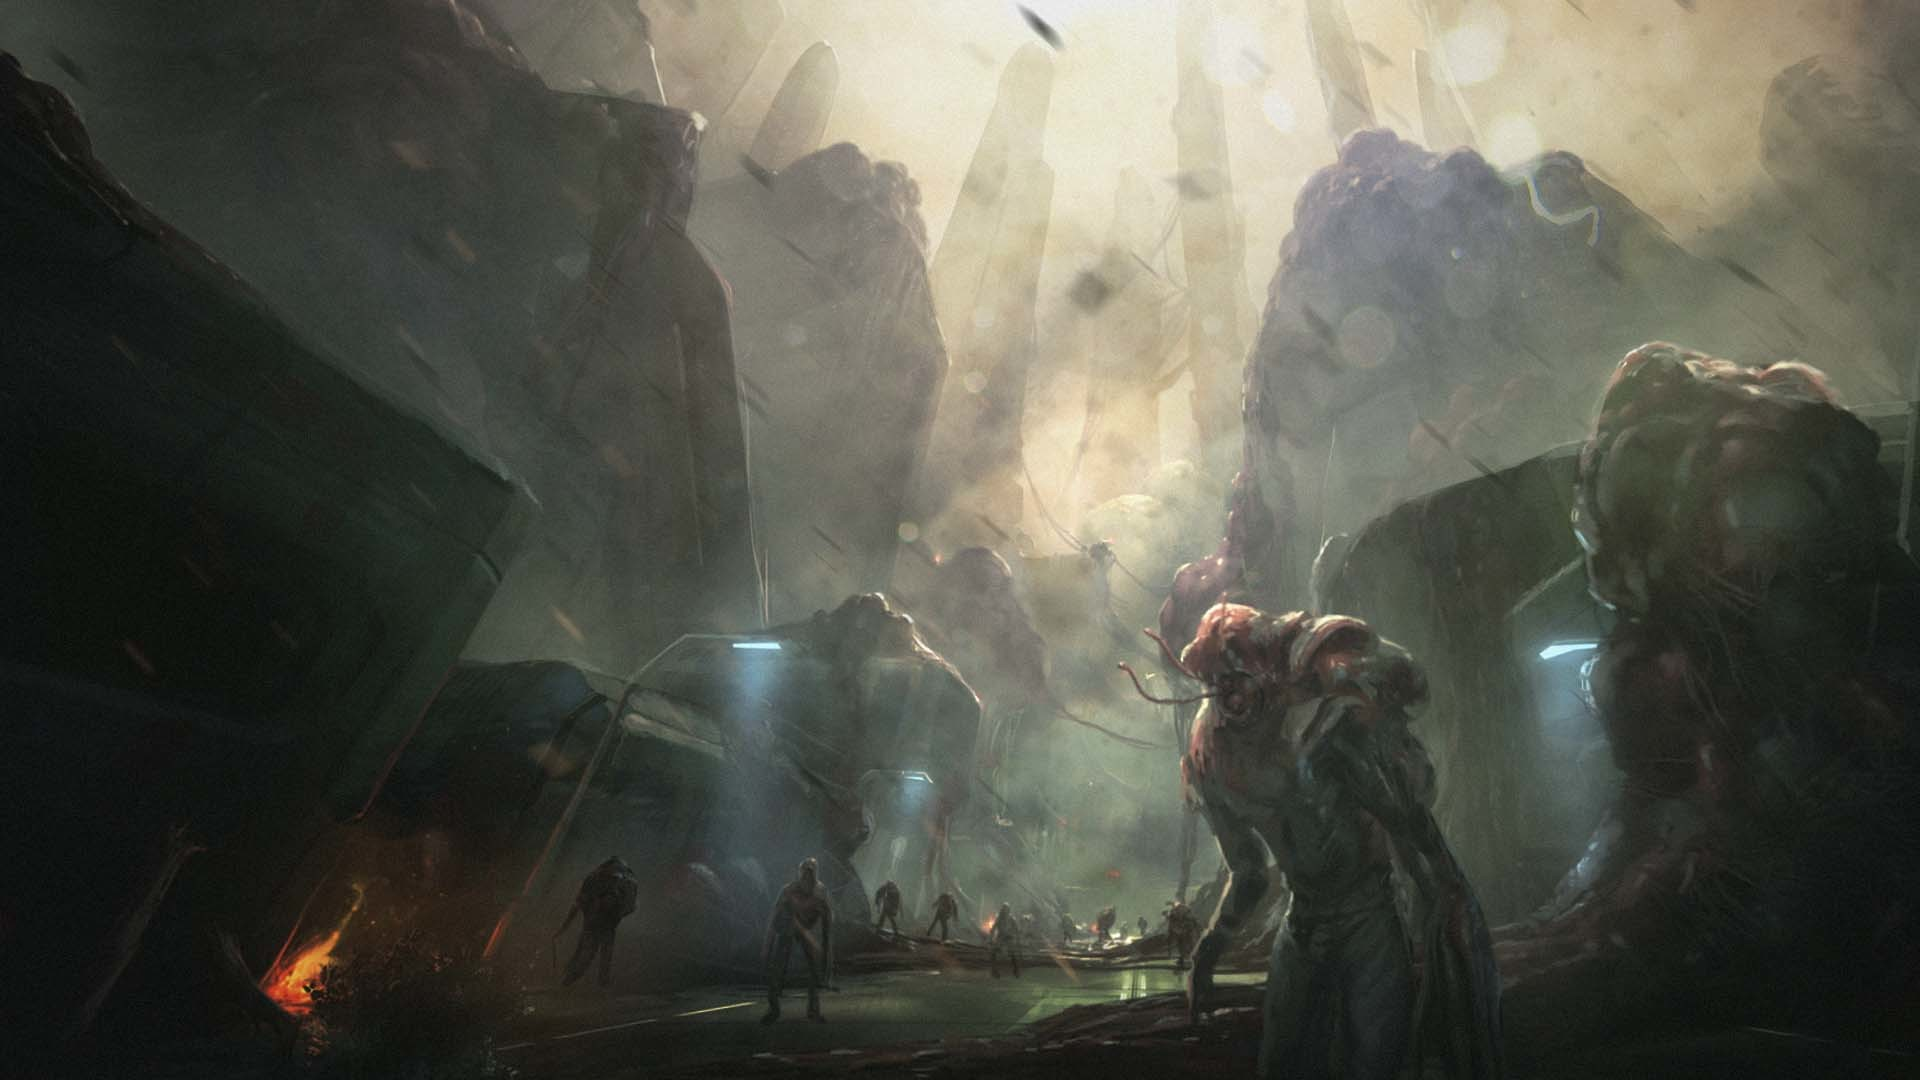 Res: 1920x1080, Wallpaper #14 Wallpaper from Halo: Spartan Assault